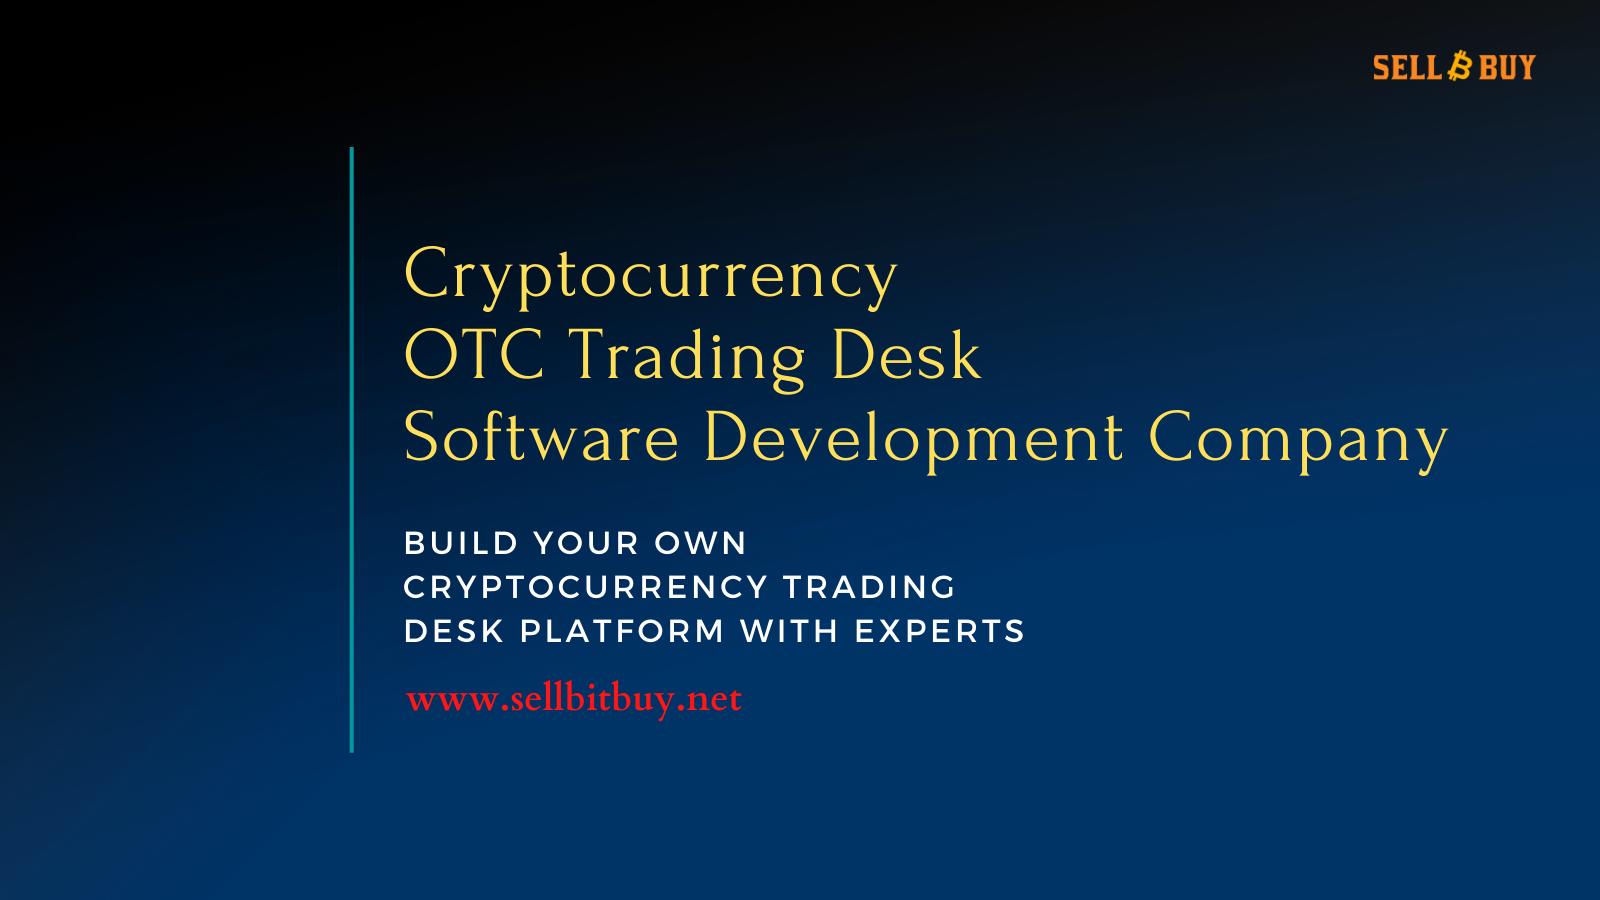 Cryptocurrency OTC Trading Desk Software Development Company